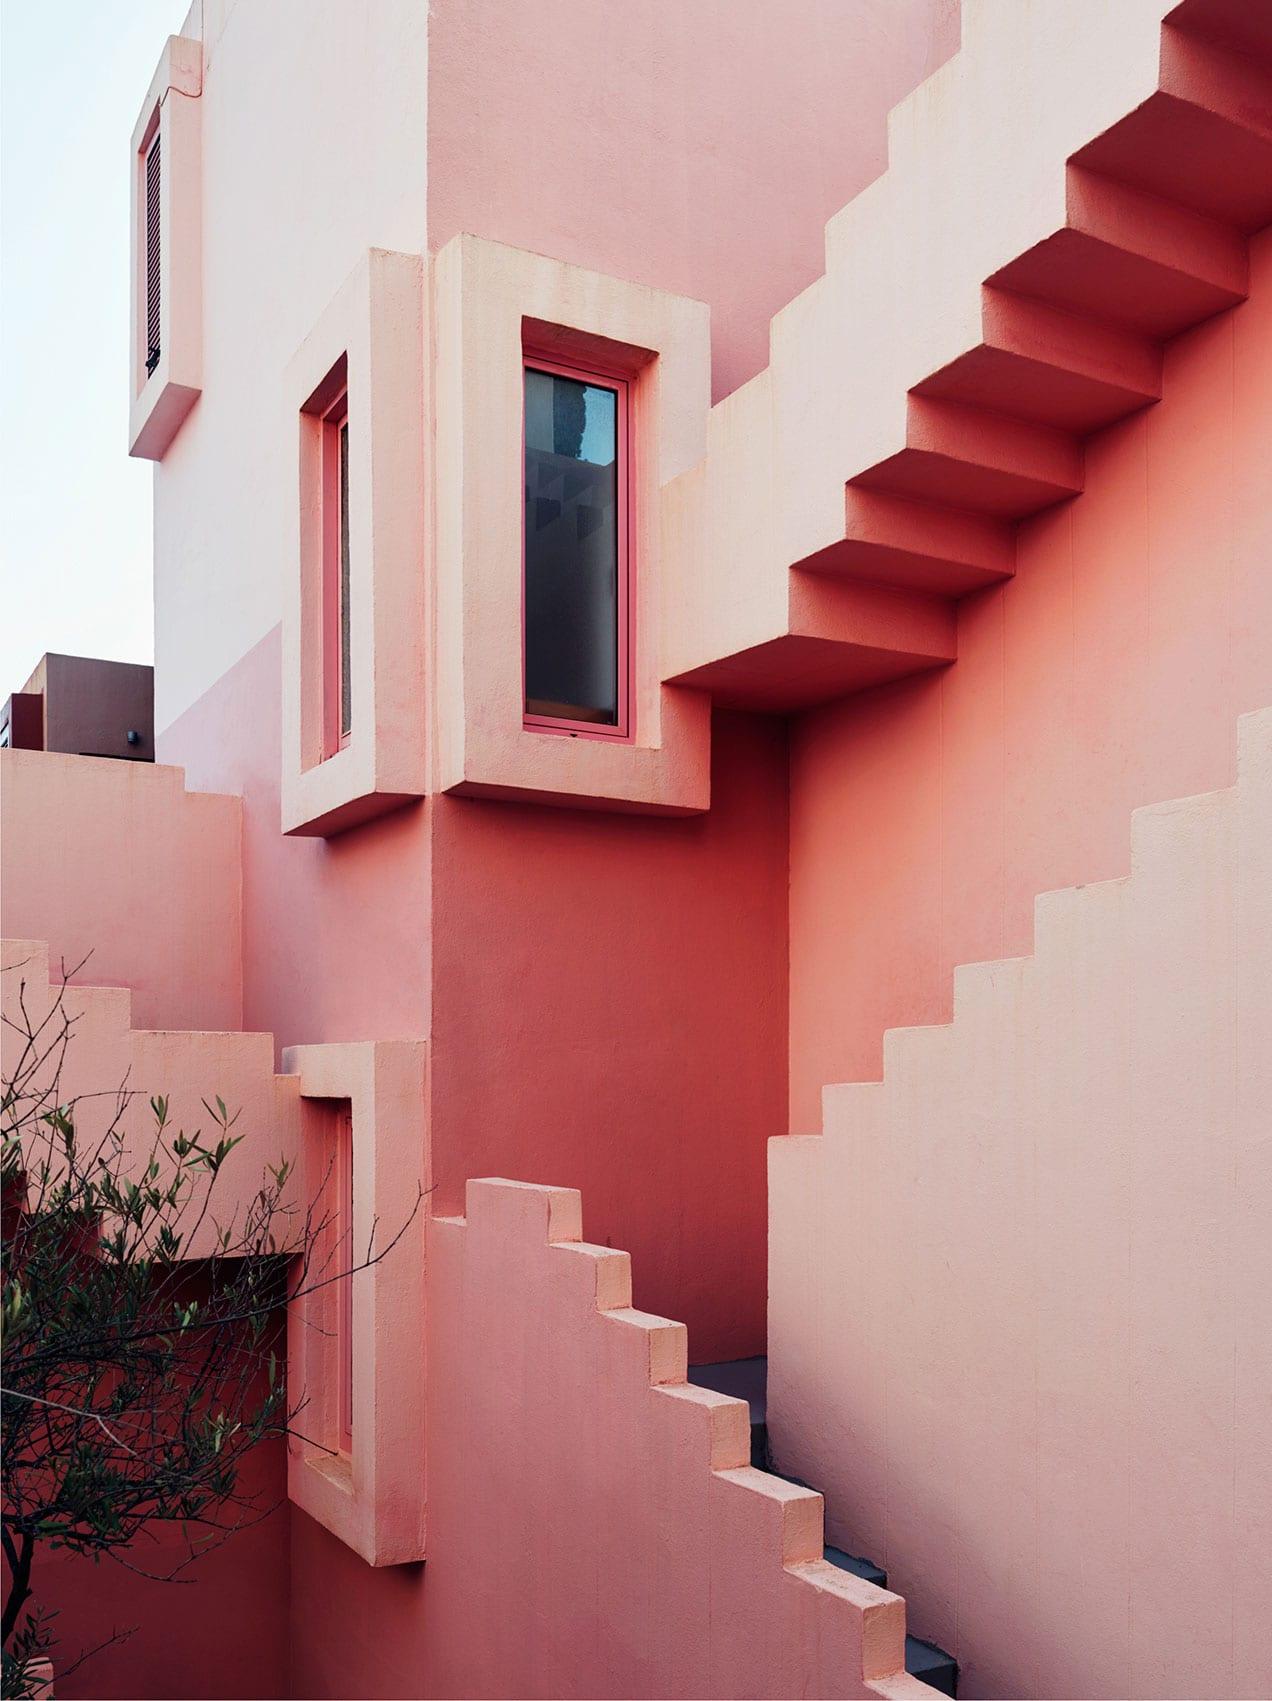 Ricardo Bofill's Red Wall (La Muralla Roja) Housing Project in Calpe, Spain | Yellowtrace